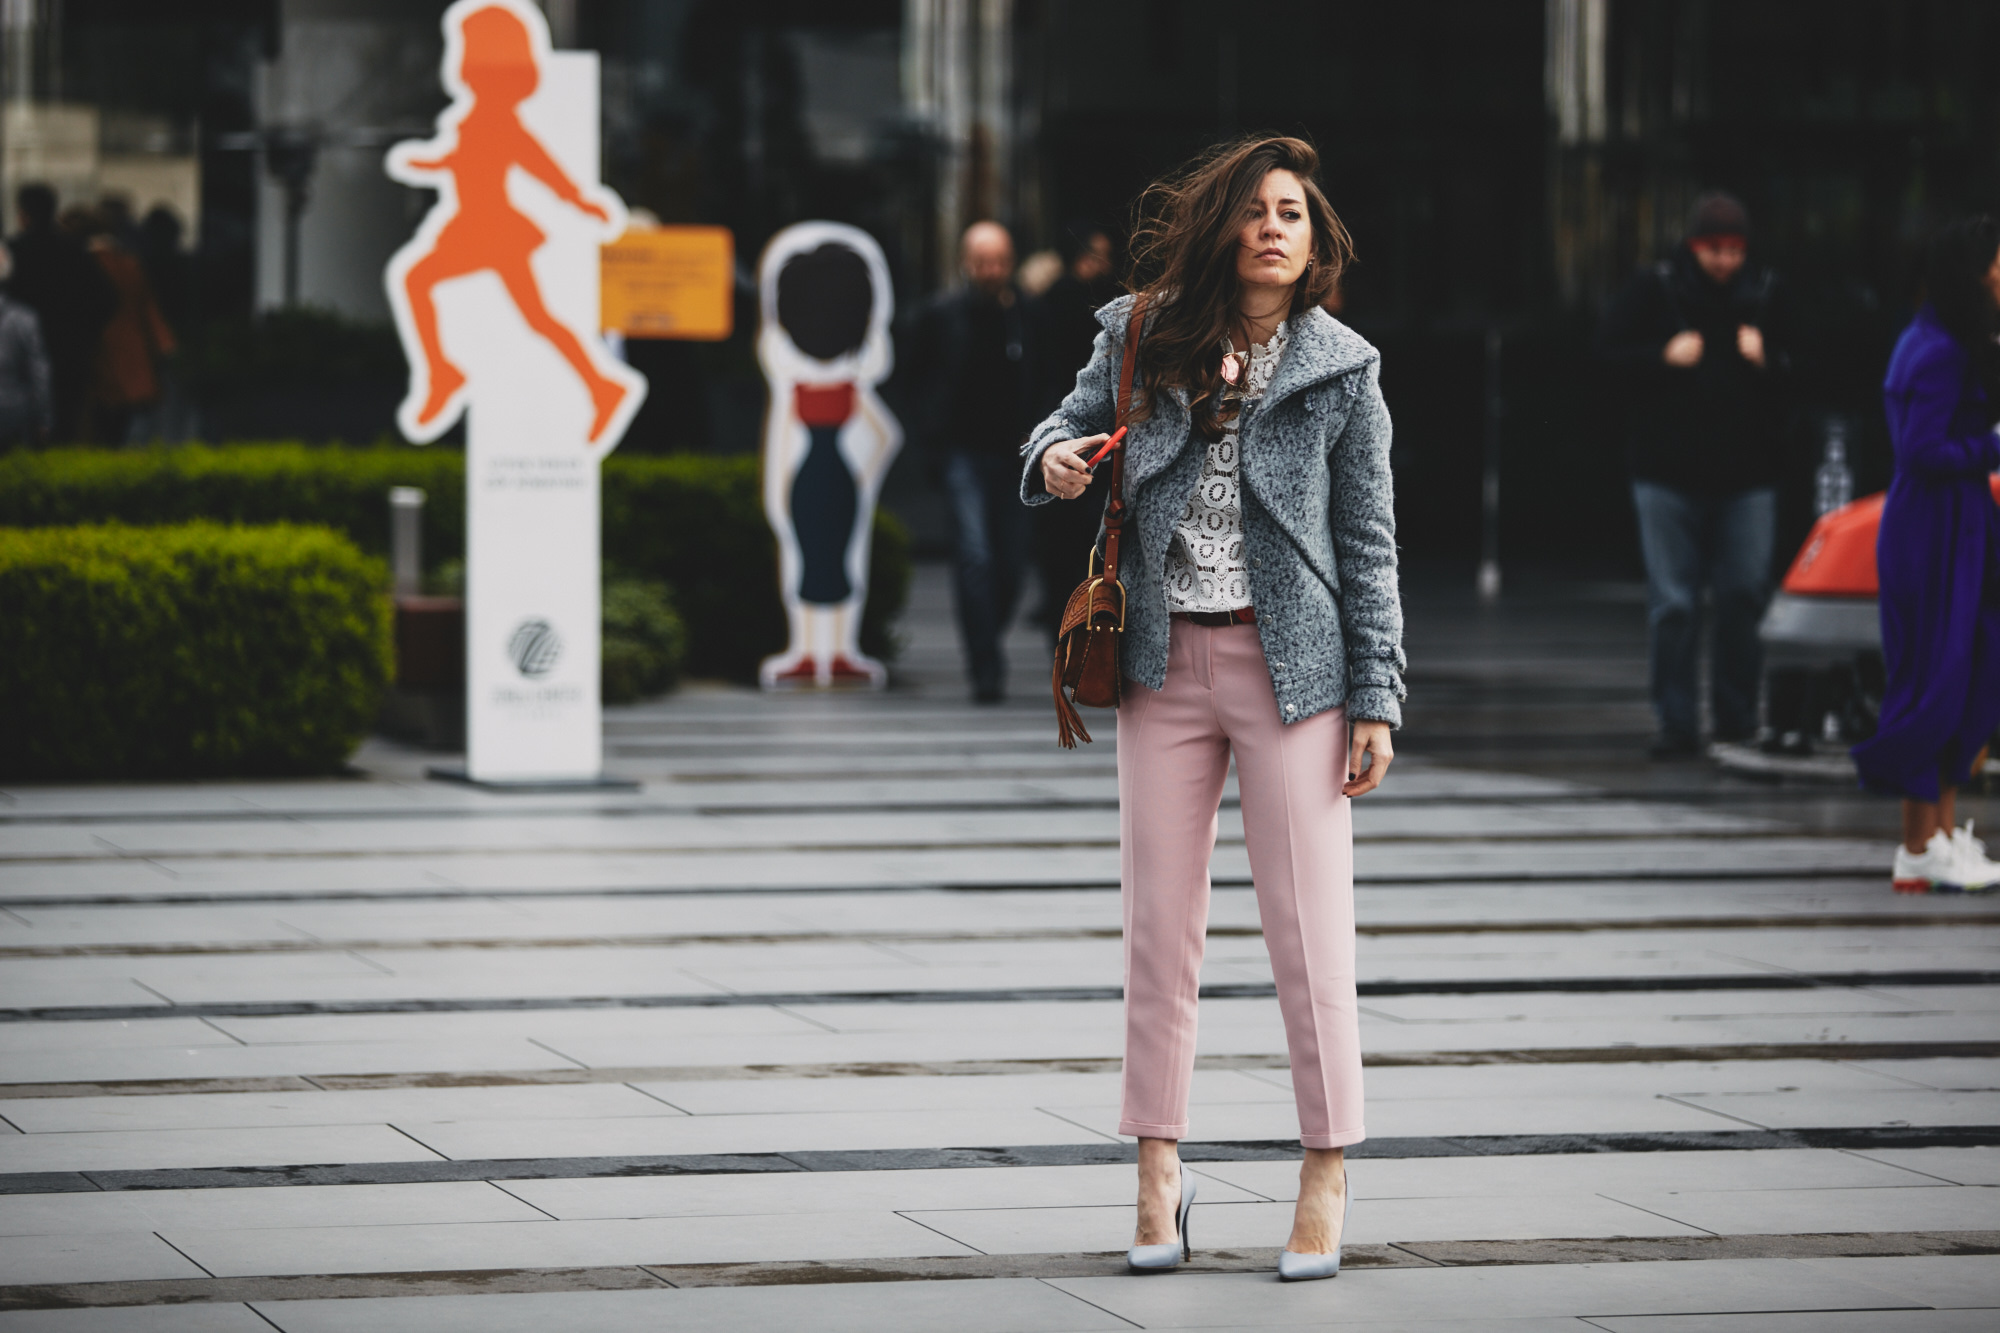 billur saatci, street style, mbfwi, off ne giysem, turkish style blogger, mercedes benz fashion week istanbul, fee dan, mybestfriends, fendi, rayban, selfportrait, chloe